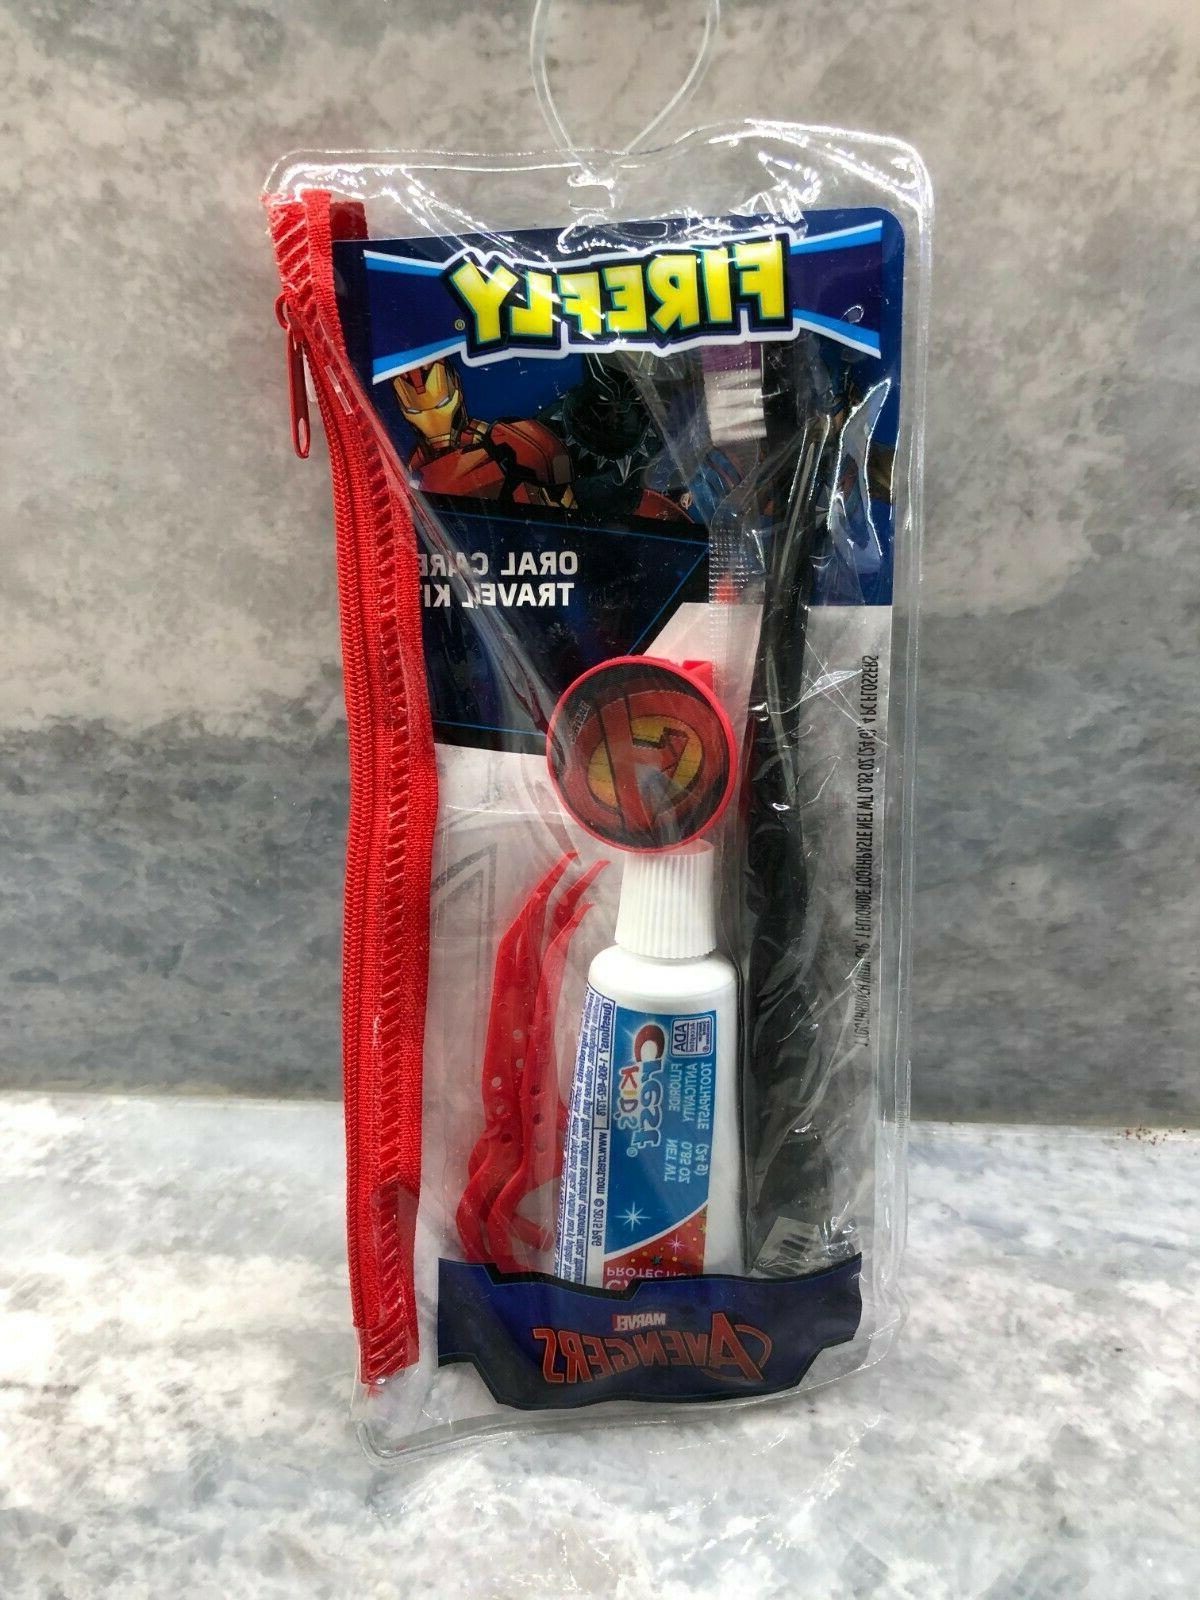 Firefly Star Wars Dental Travel Kit pouch Toothbrush Orange